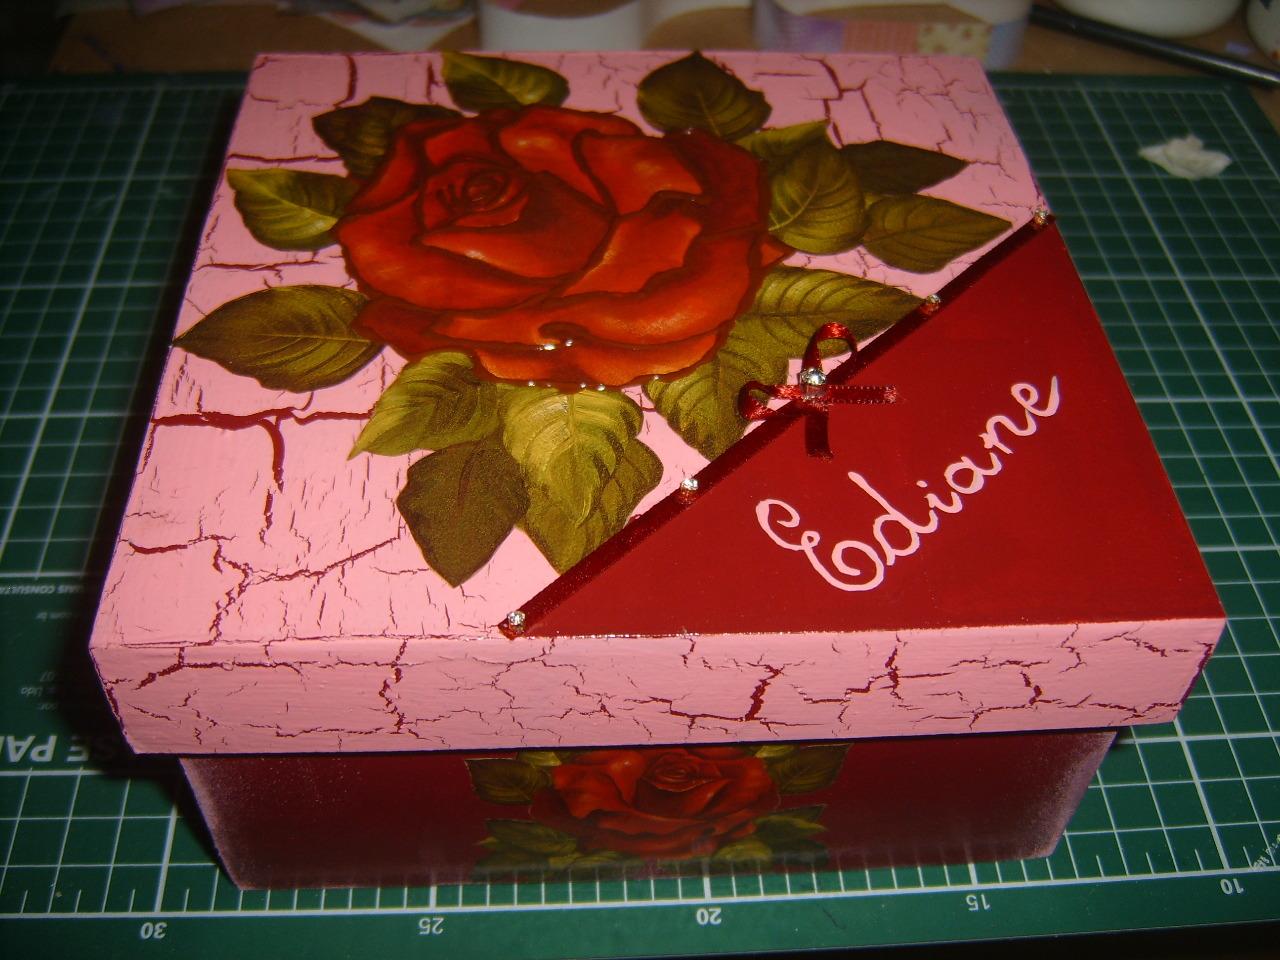 caixa mdf pintura craquele caixa mdf pintura craquele #BF0C18 1280x960